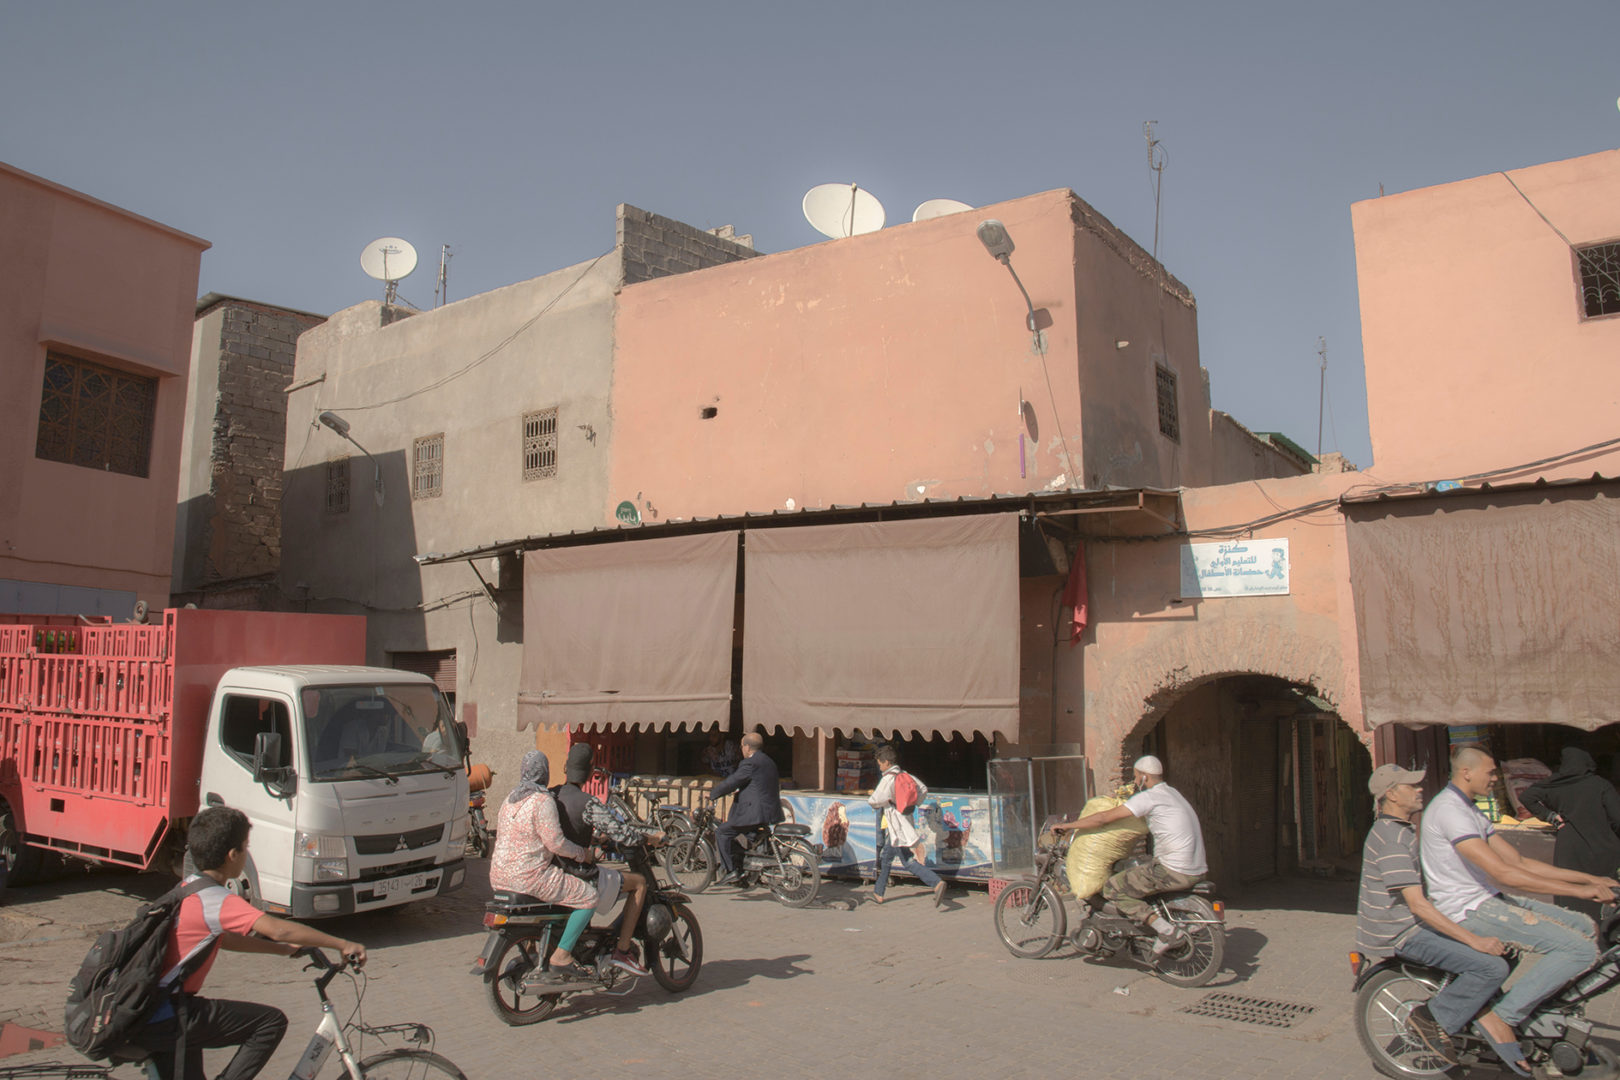 A corner in Marrakech